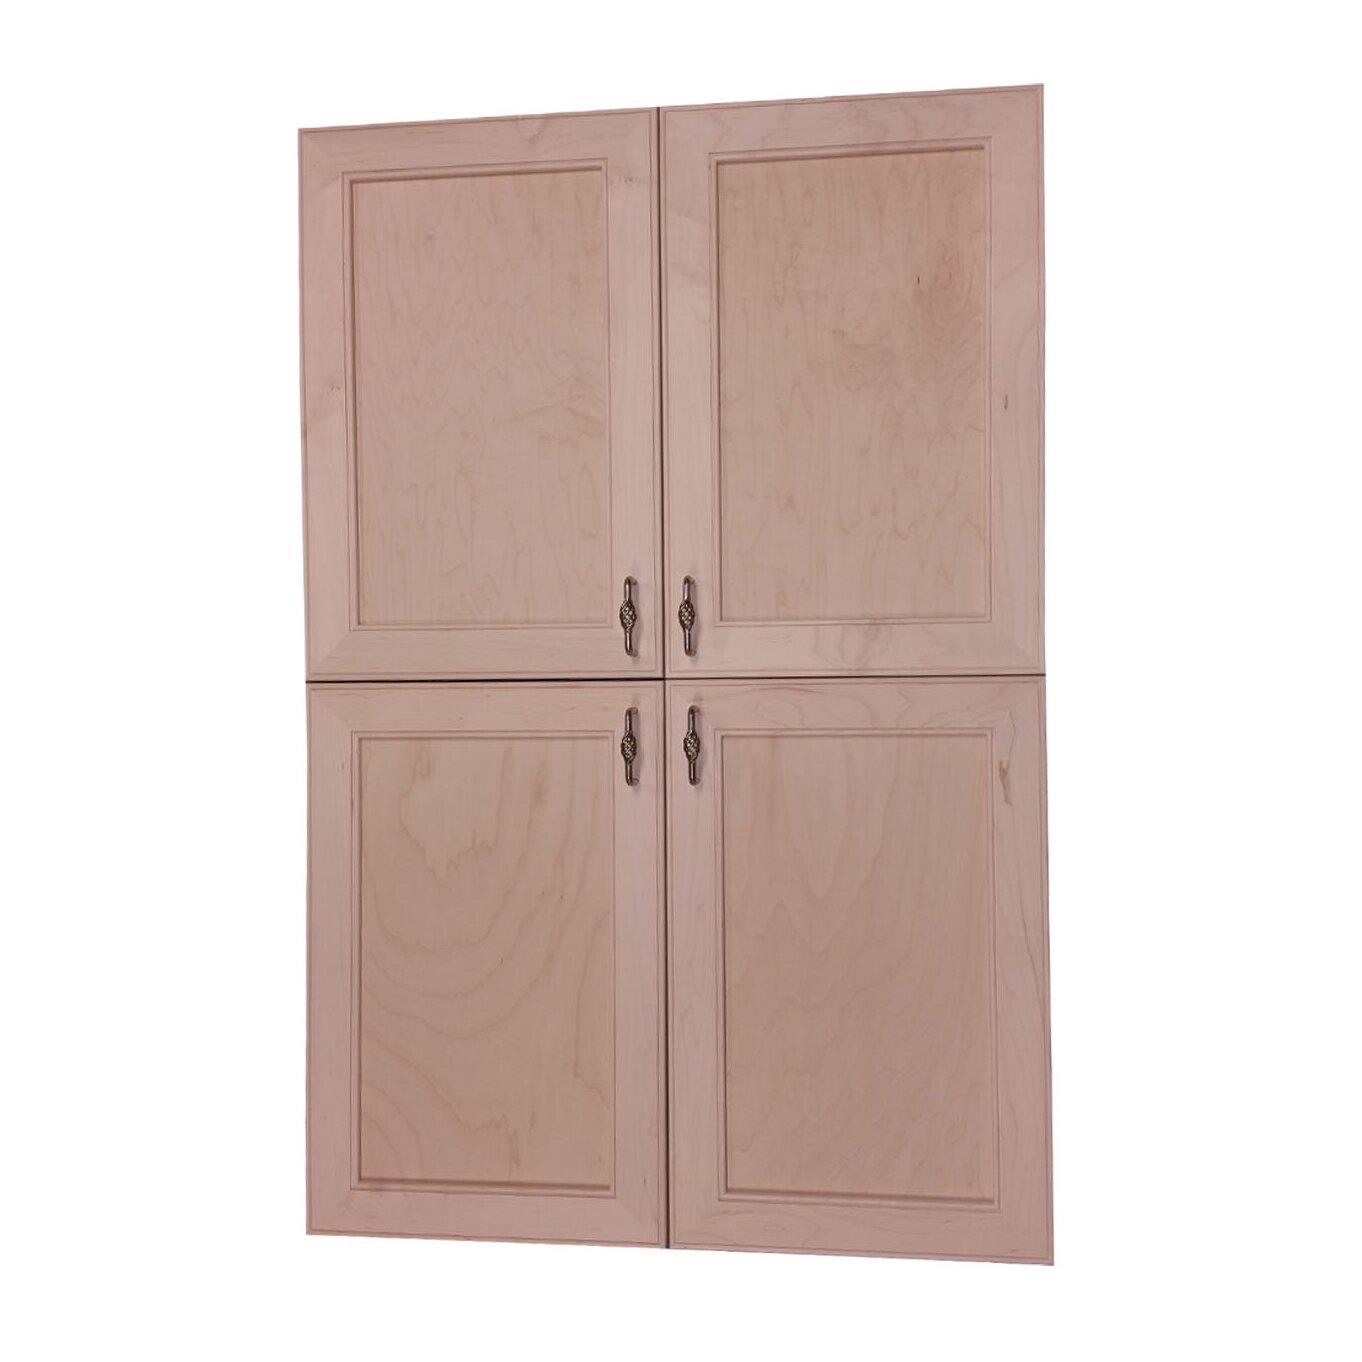 Wg wood products village kitchen pantry wayfair for Wayfair kitchen cabinets